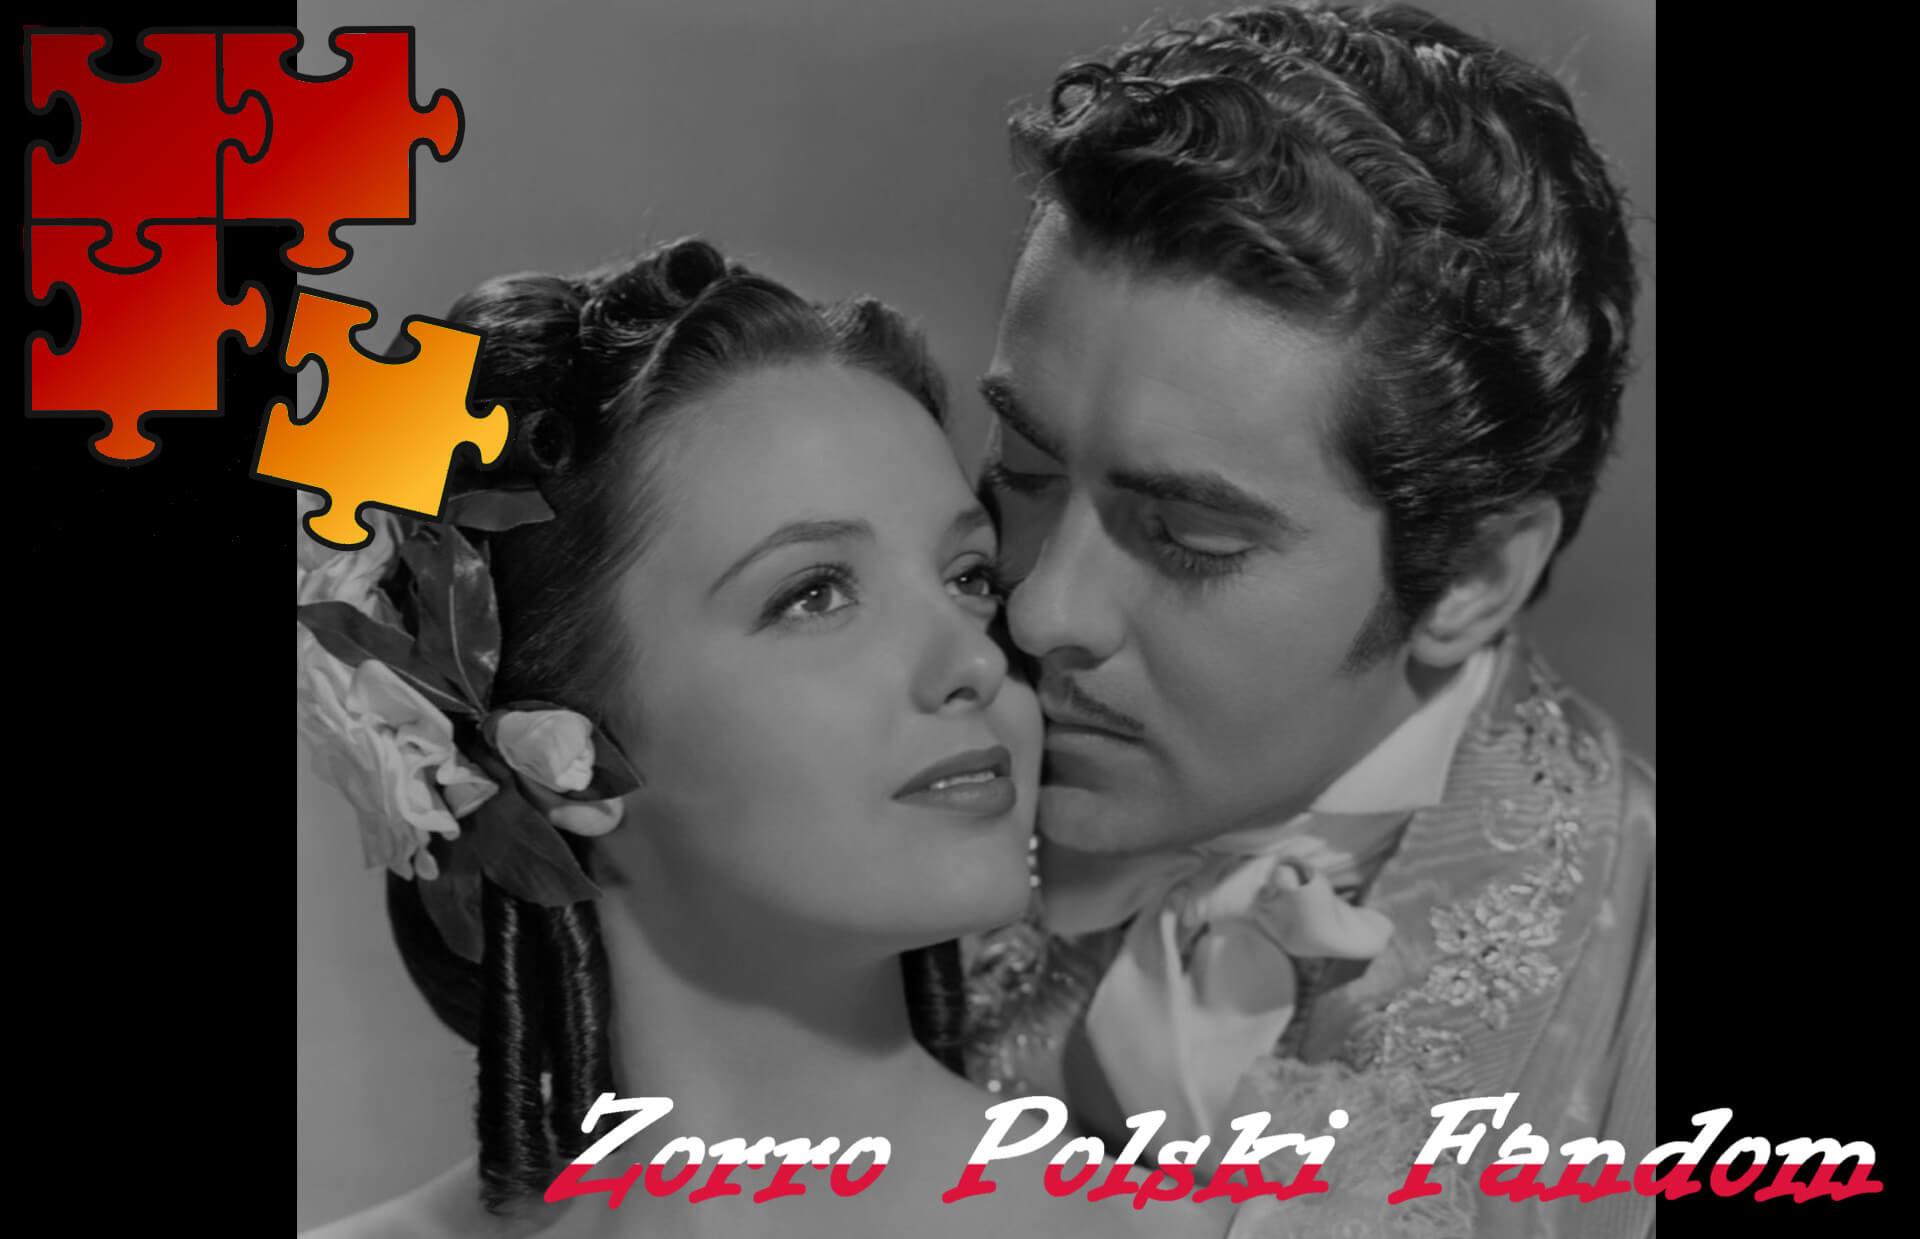 Jigsaw Puzzle Zorro Mark of Zorro 1940 - Diego i Lolita ENG